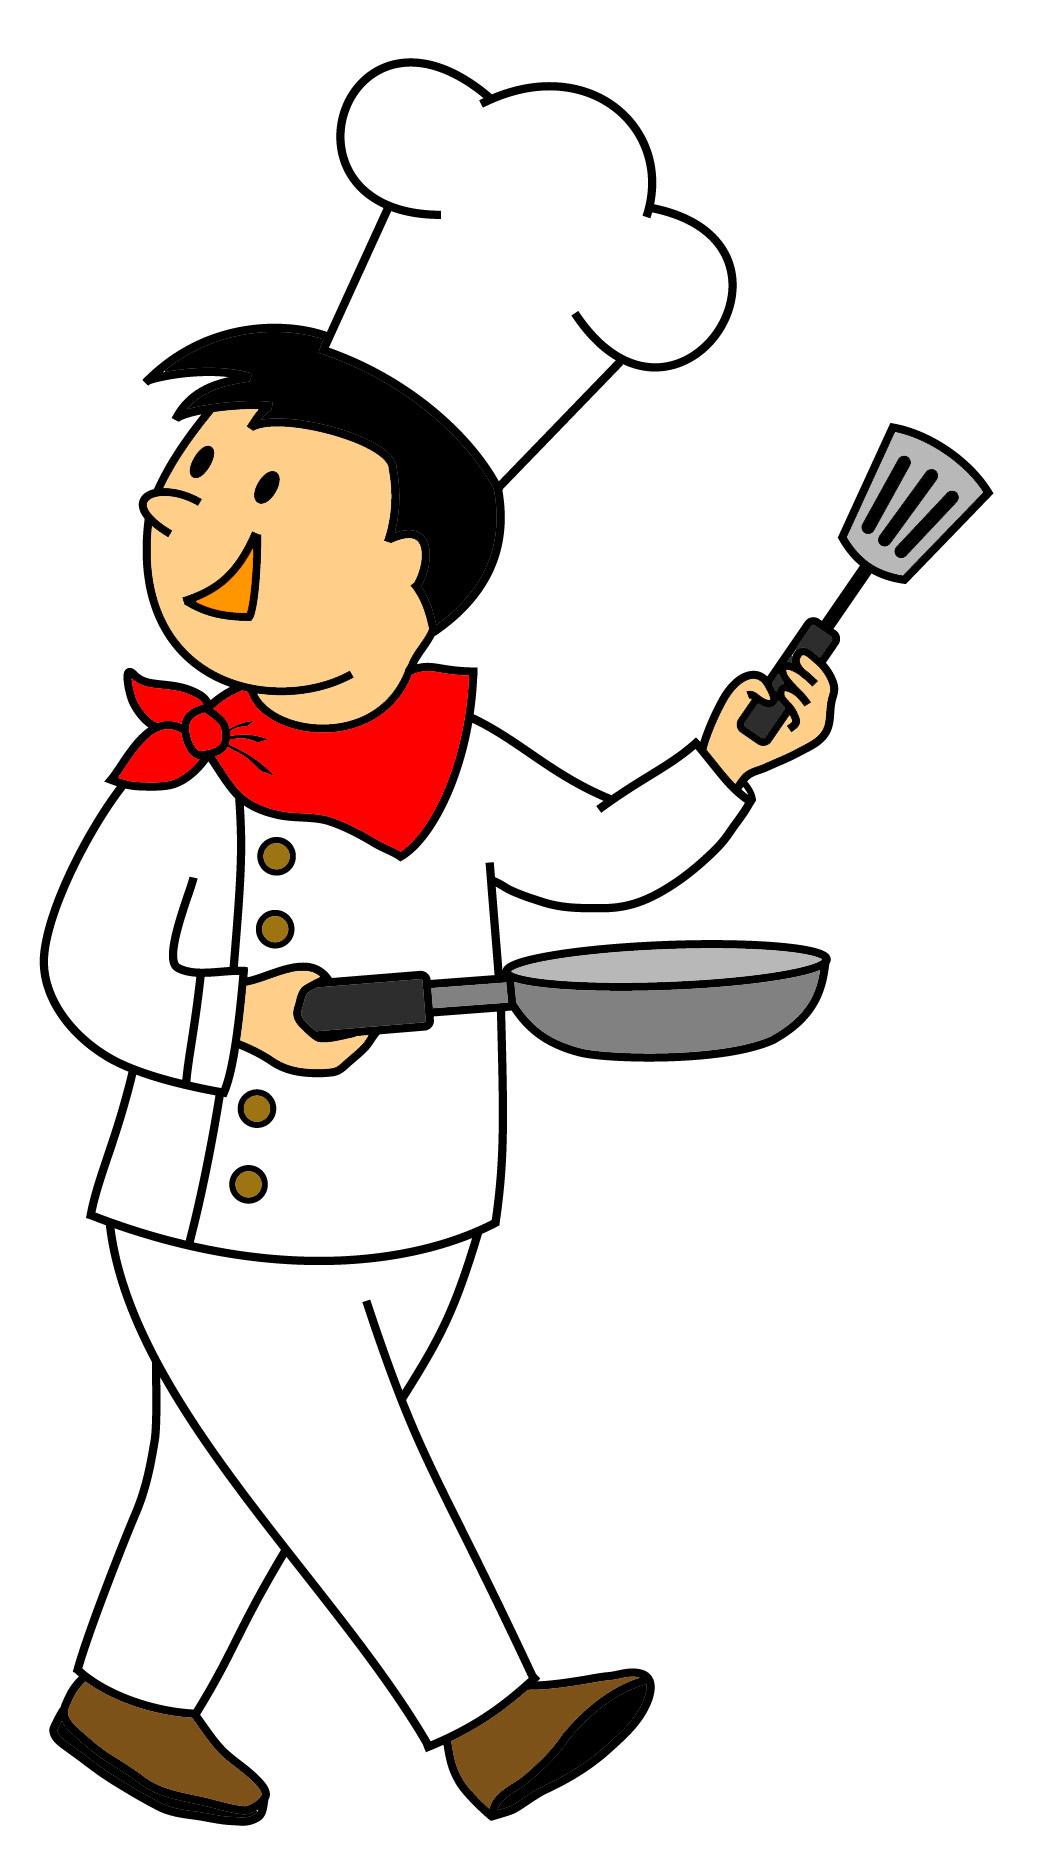 chef ok free images at clker com vector clip art online